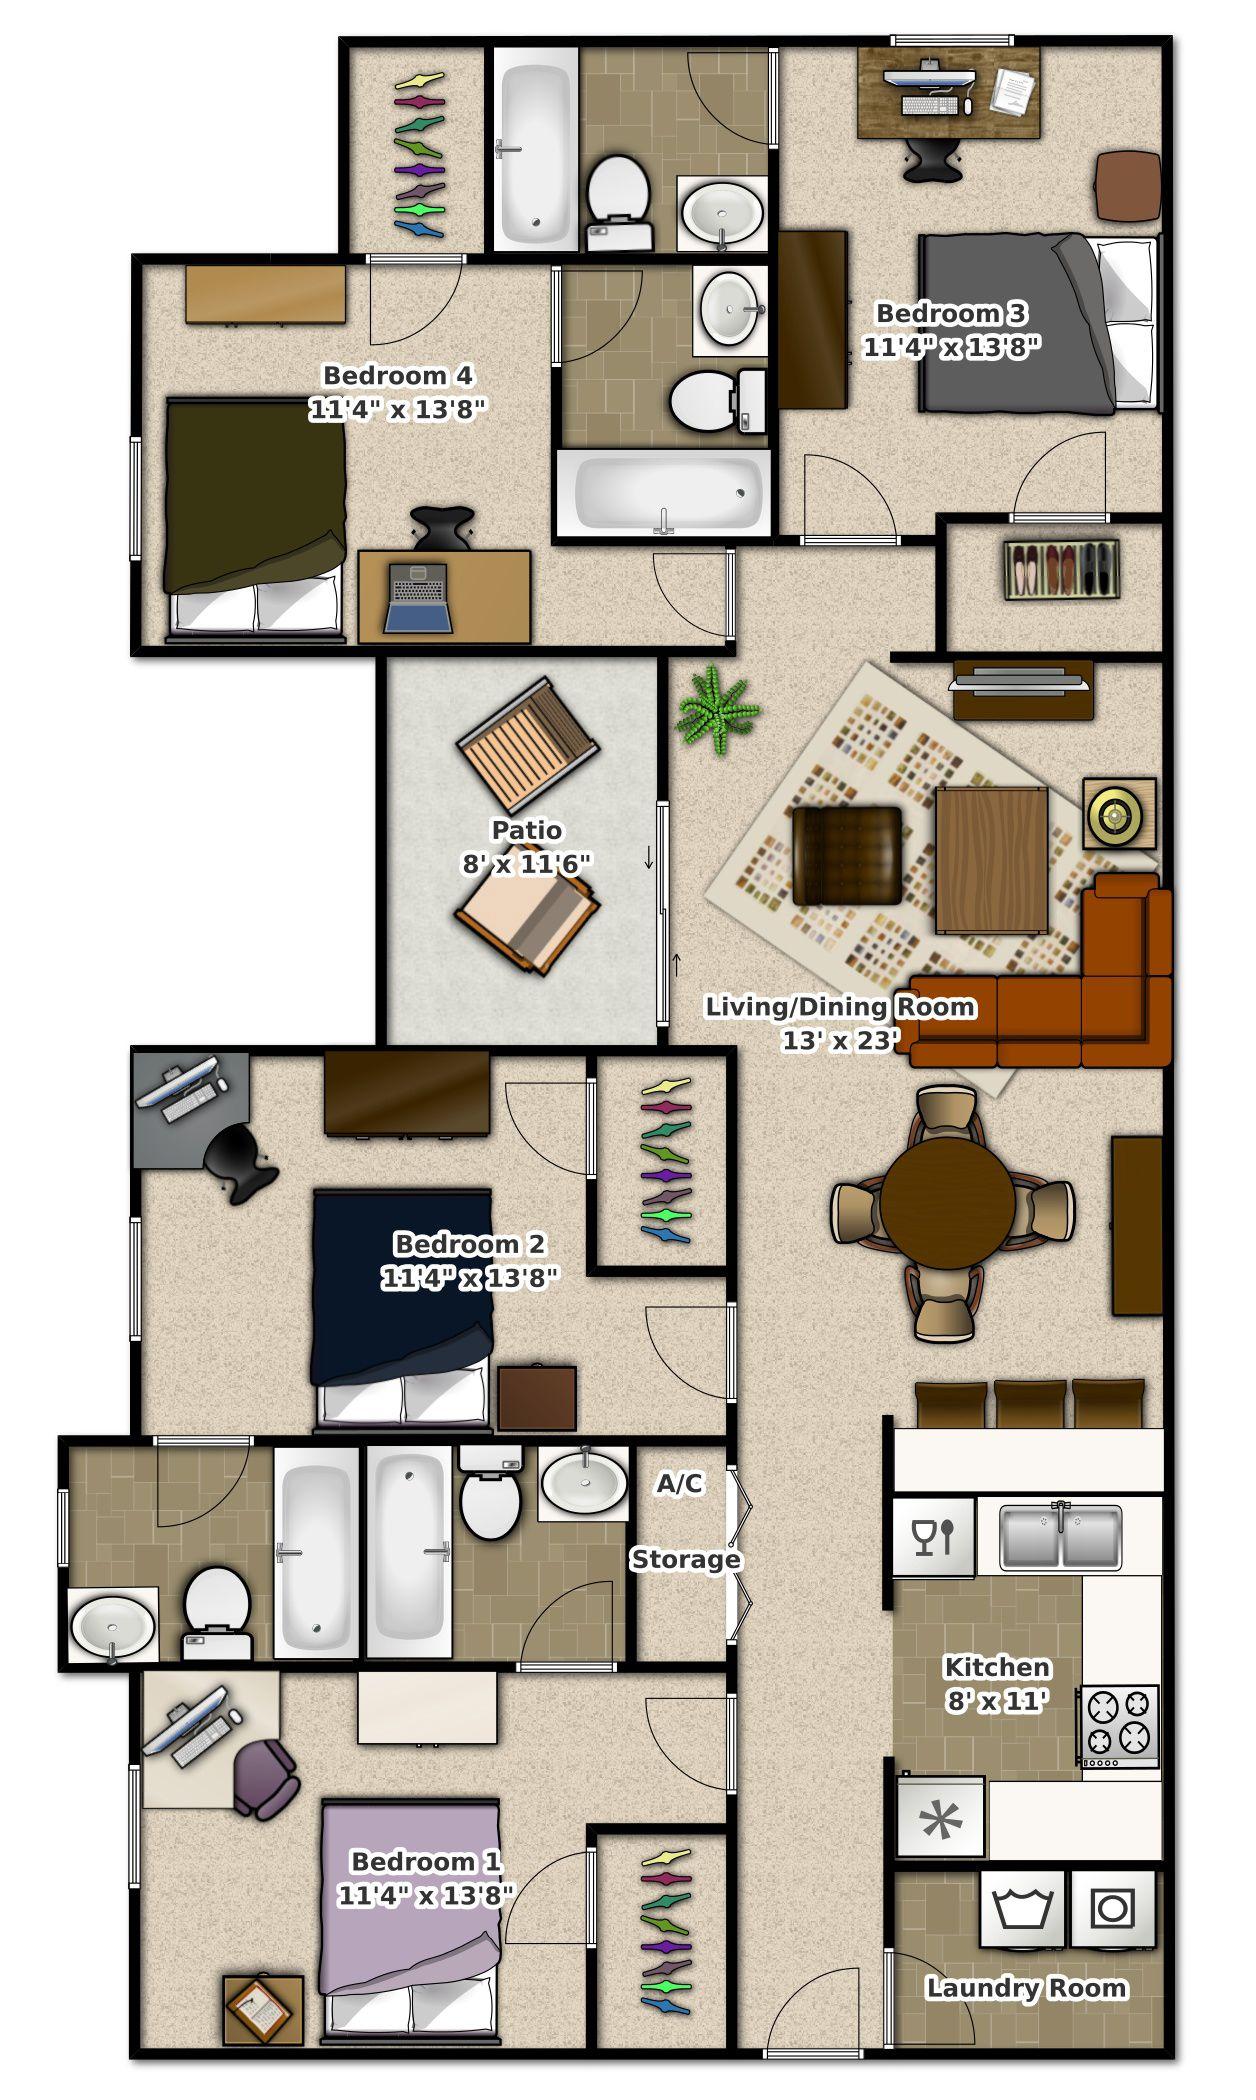 Phase 2 4 Bedroom Apartment At Stoneridge Apartments Gainesville Fl Bedroom Apartment Two Bedroom House